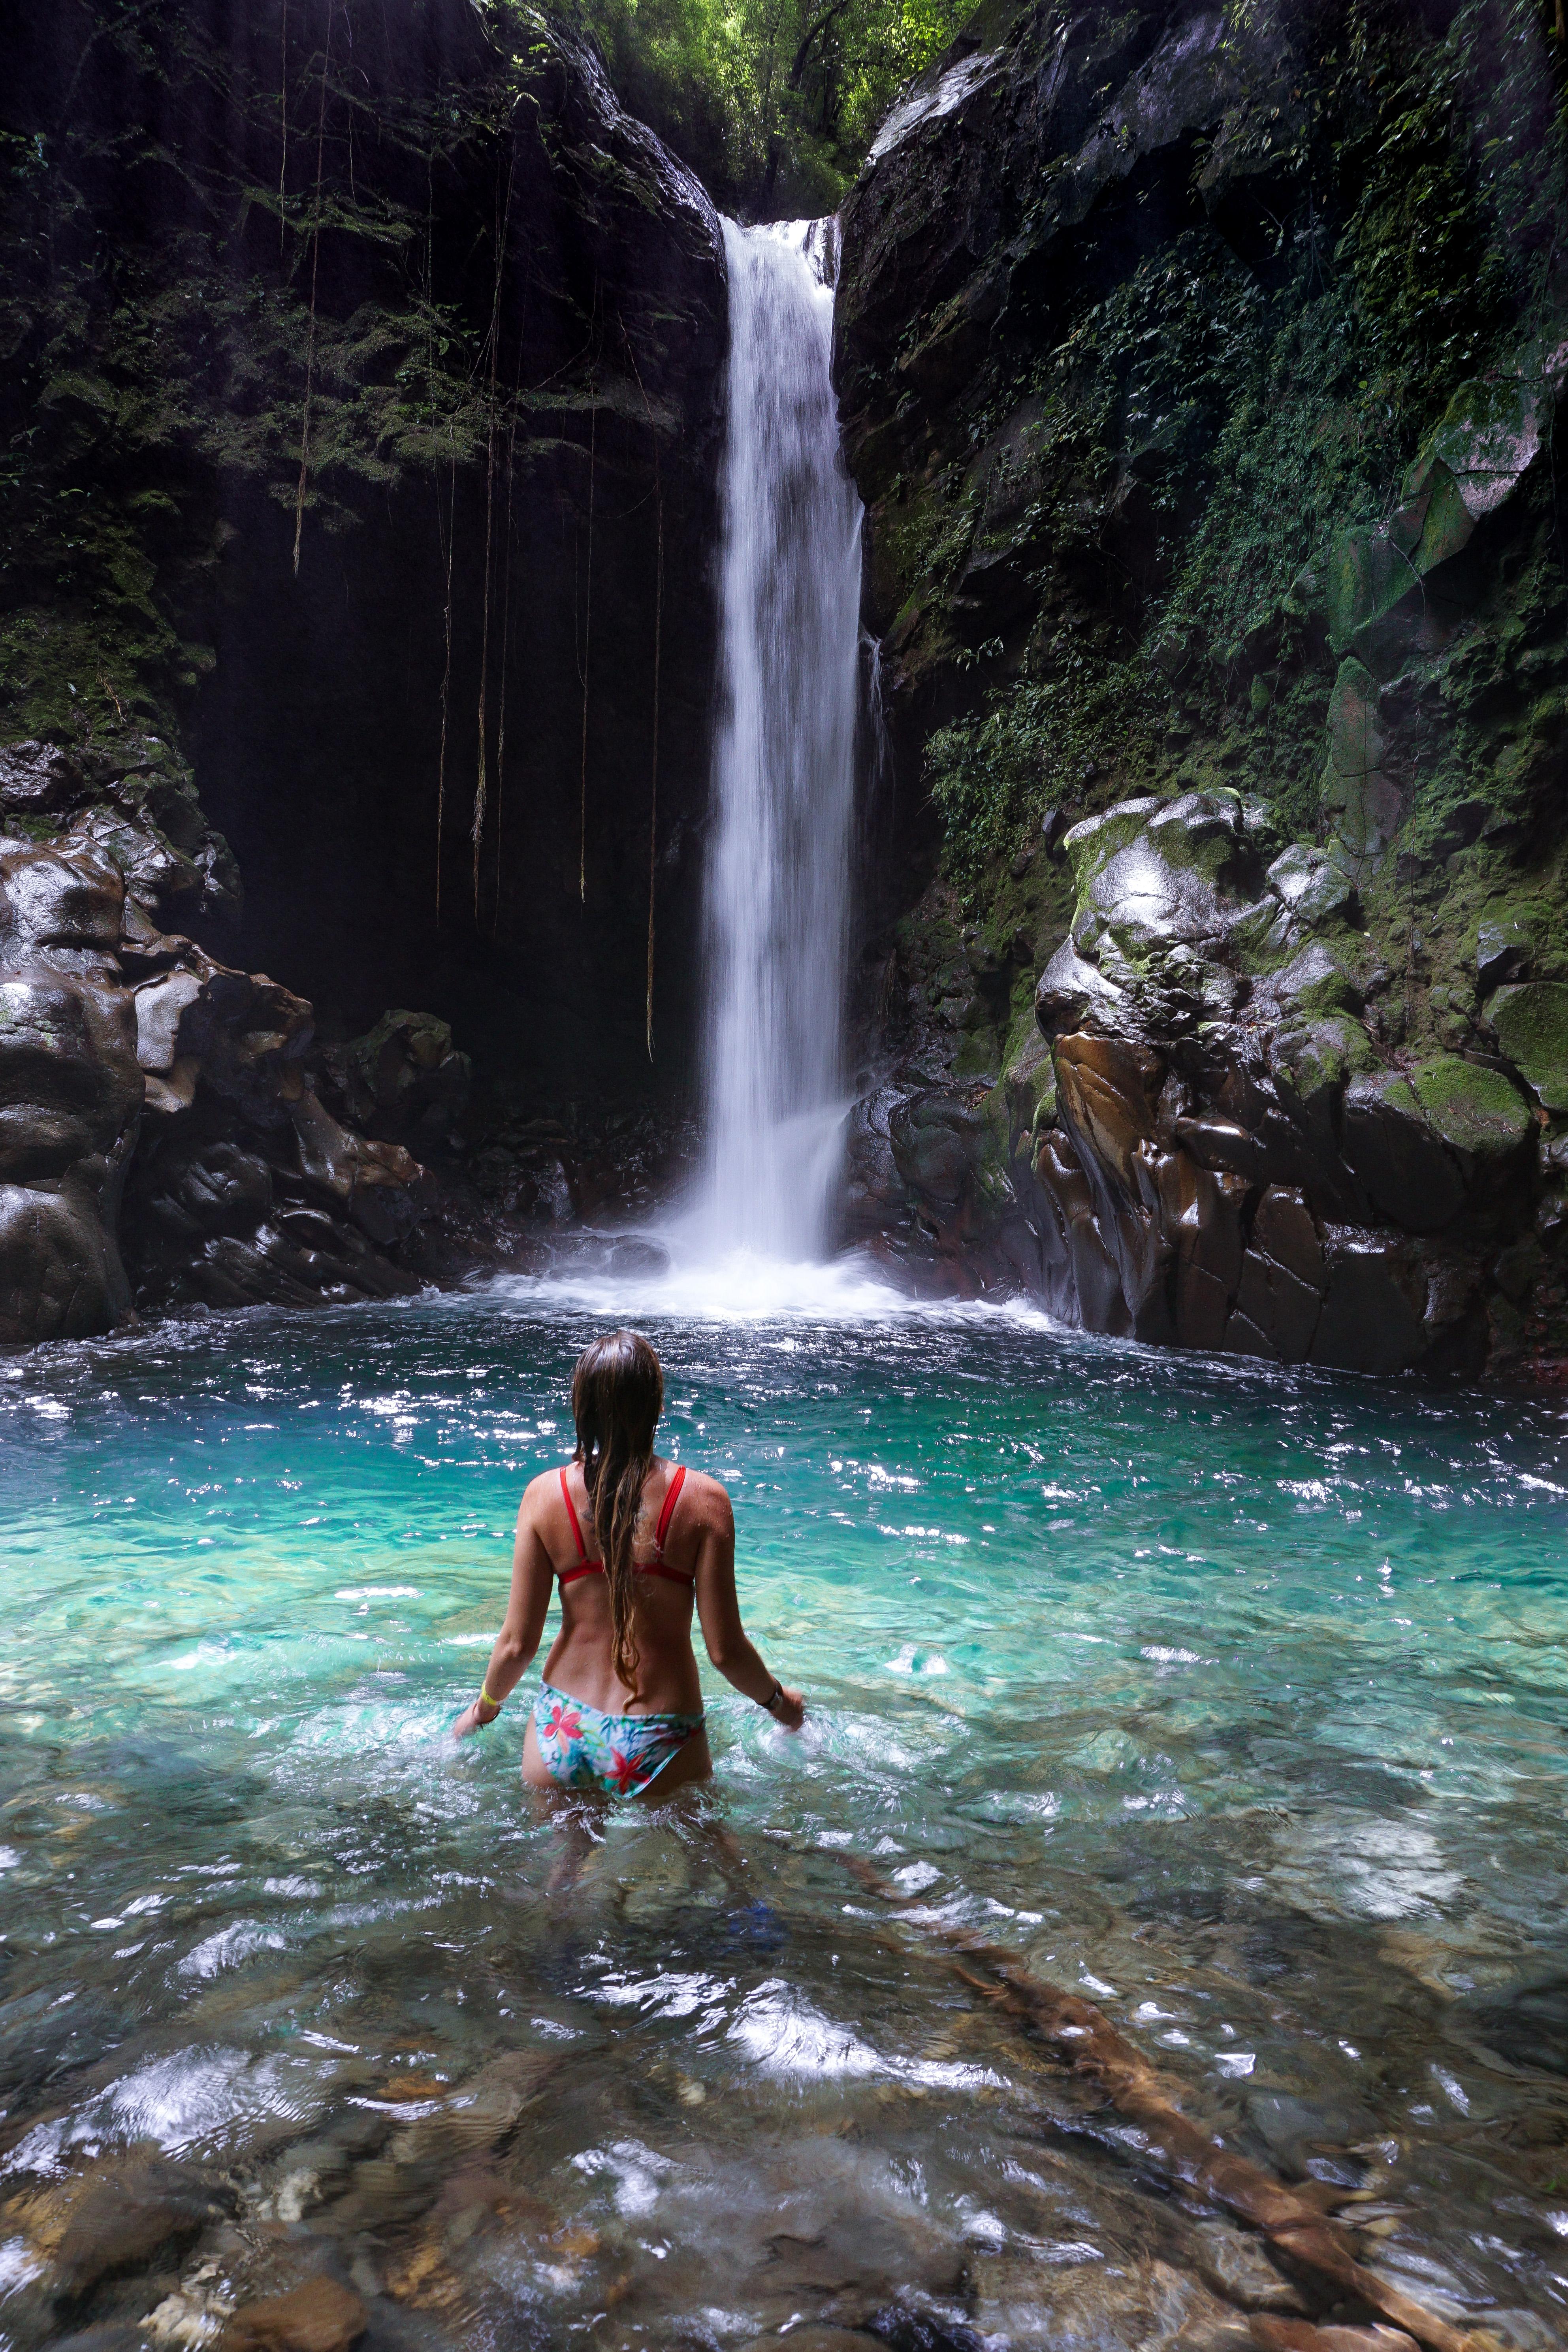 waterfall, oropendula, rincon de la vieja, liberia, costa rica, rincón de la vieja